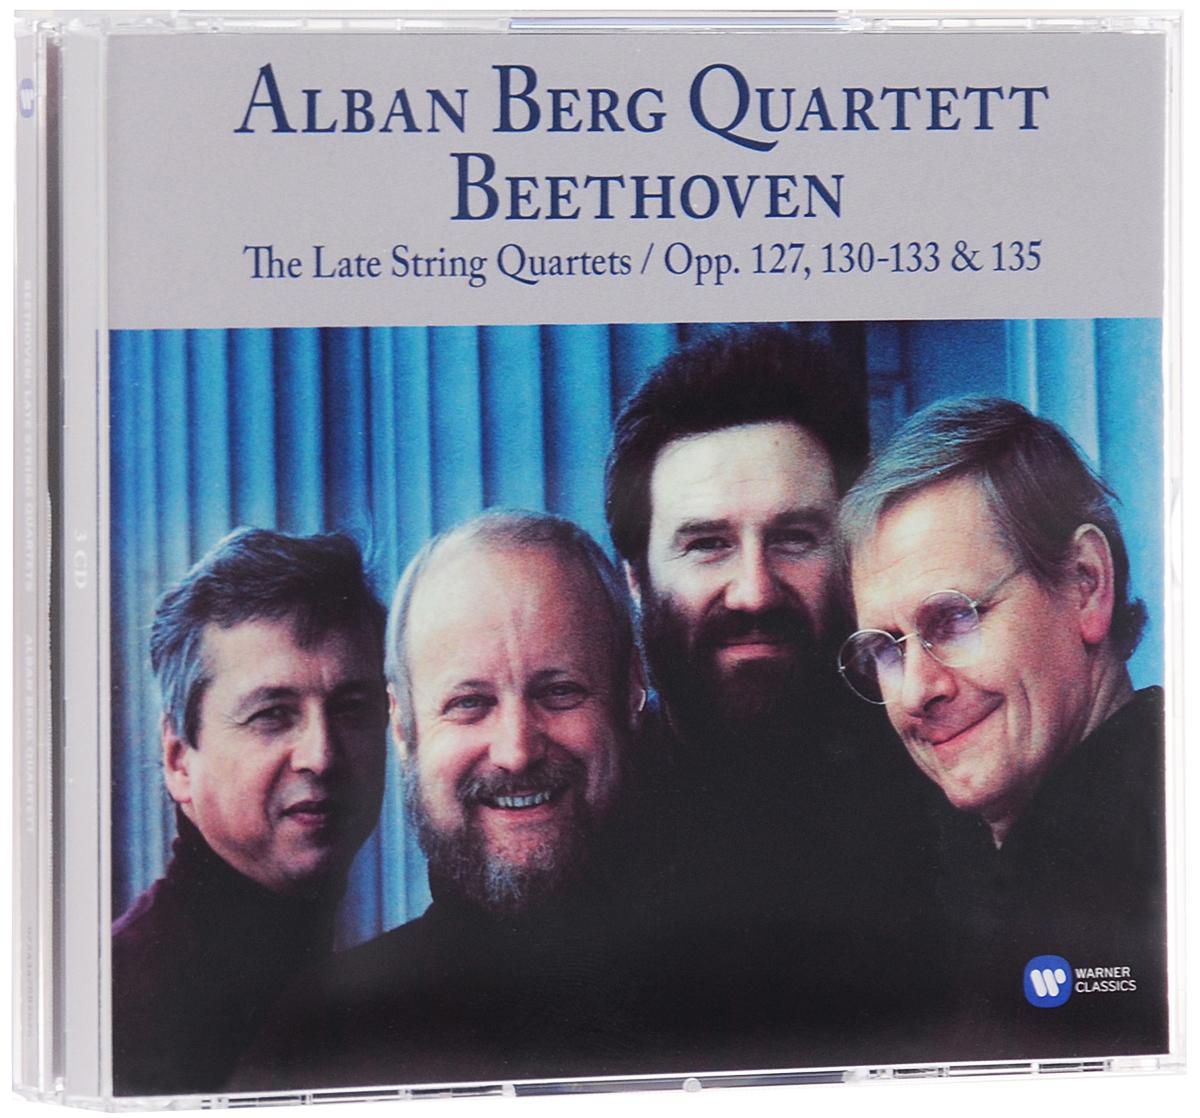 Alban Berg Quartet,Гюнтер Пичлер,Герхард Шульц,Томас Какуска,Валентин Эрбен Alban Berg Quartett. Beethoven. The Late String Quartets. Opp. 127, 130, 131, 132, 133 & 135 (3 CD) danza